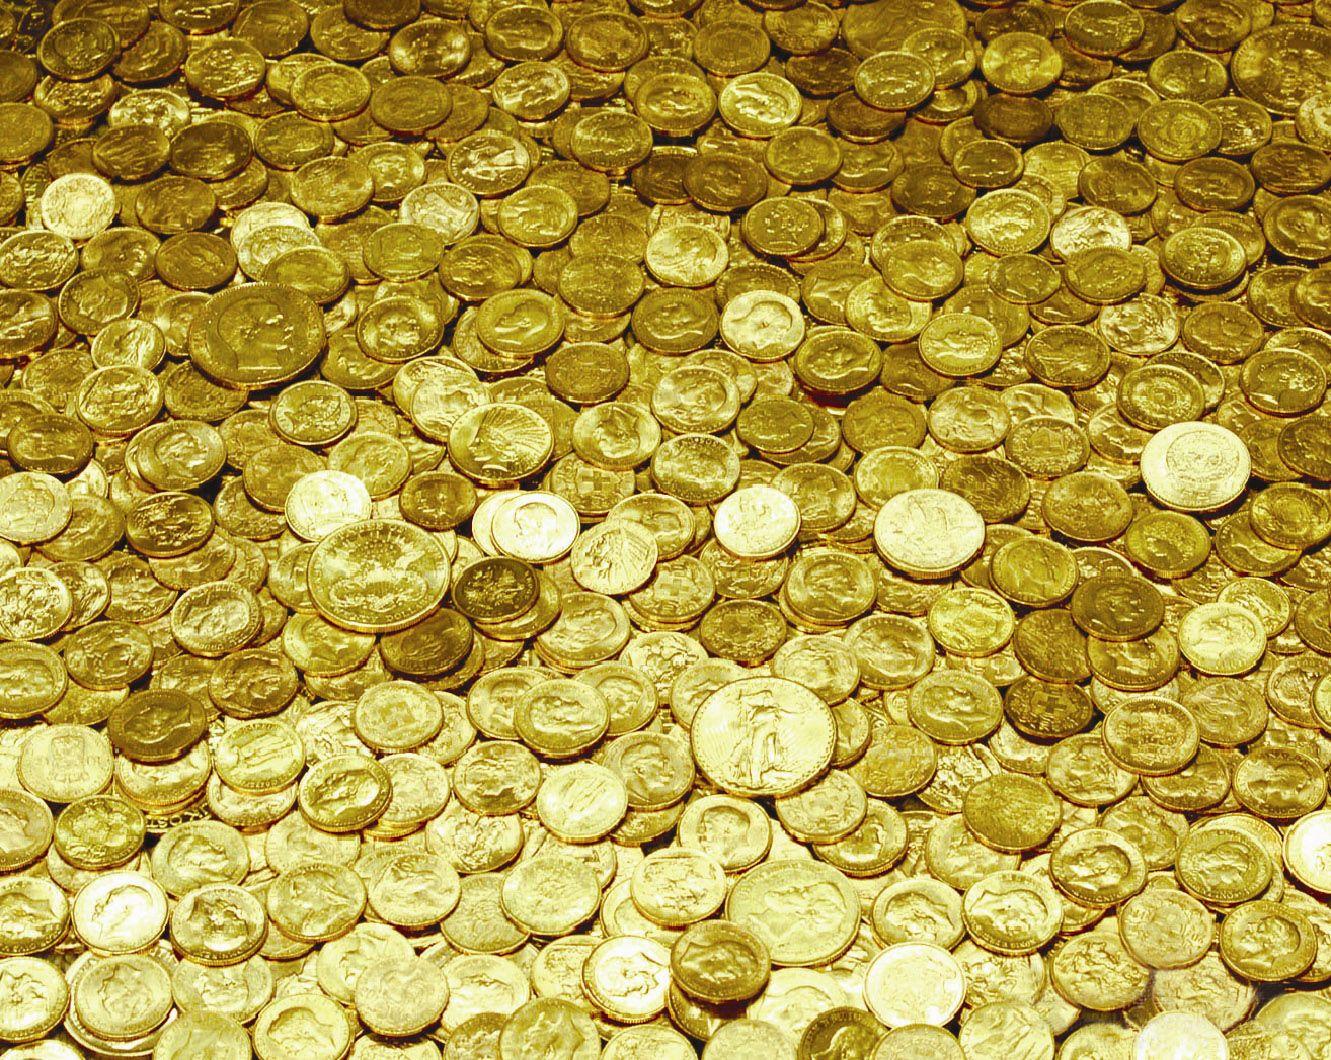 Pin De Sam Behrman En Online Casino News Lingotes De Oro Monedas Disenos De Unas